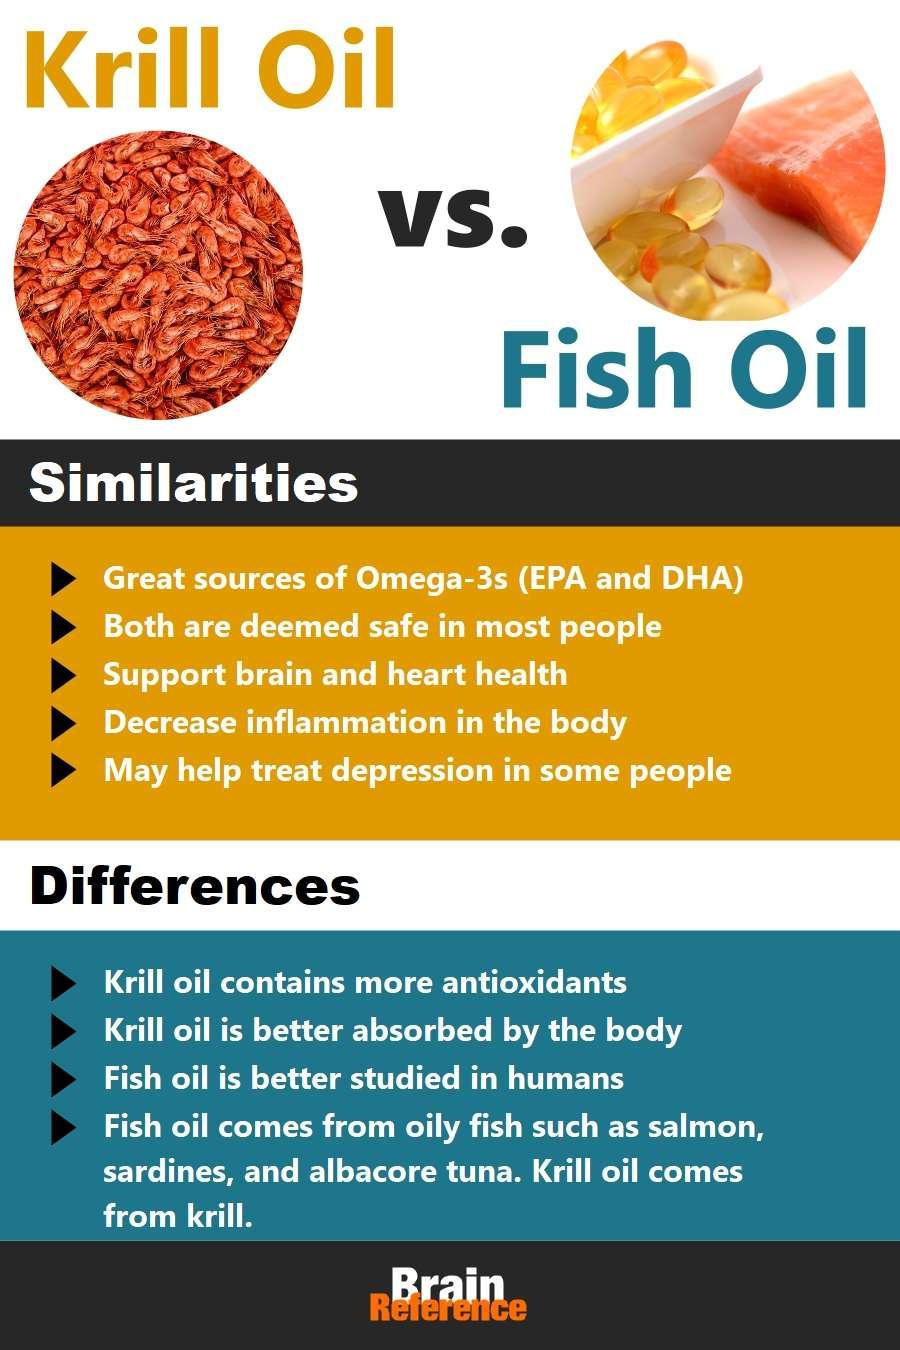 BiOmega-Usana-Krill-Oil-VS-Fish-Oil